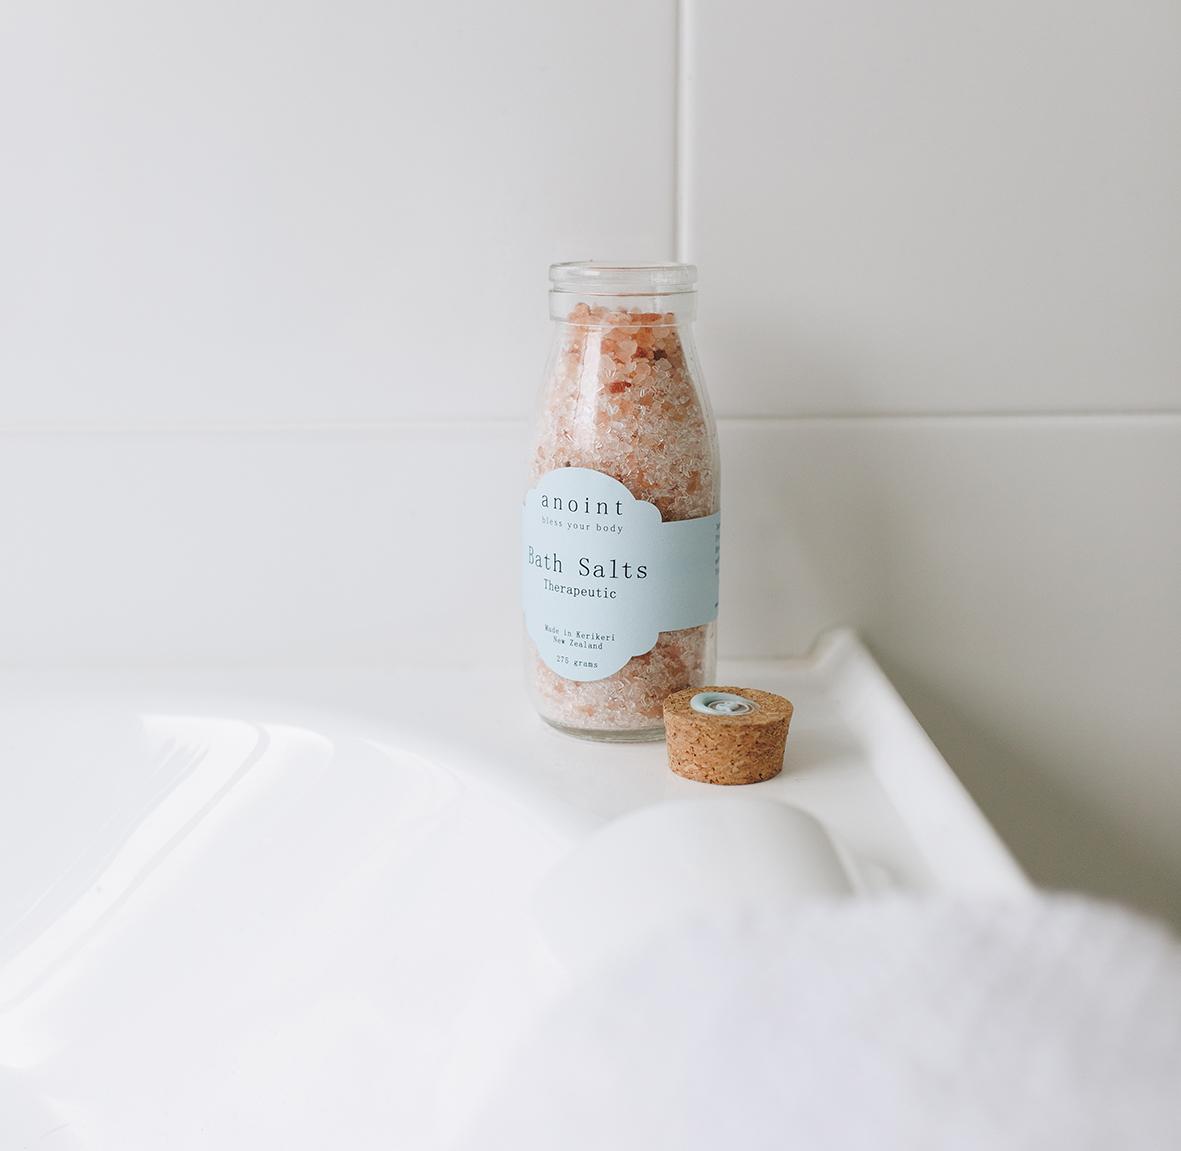 Bath_Salts_Gratitude_anoint_skincare